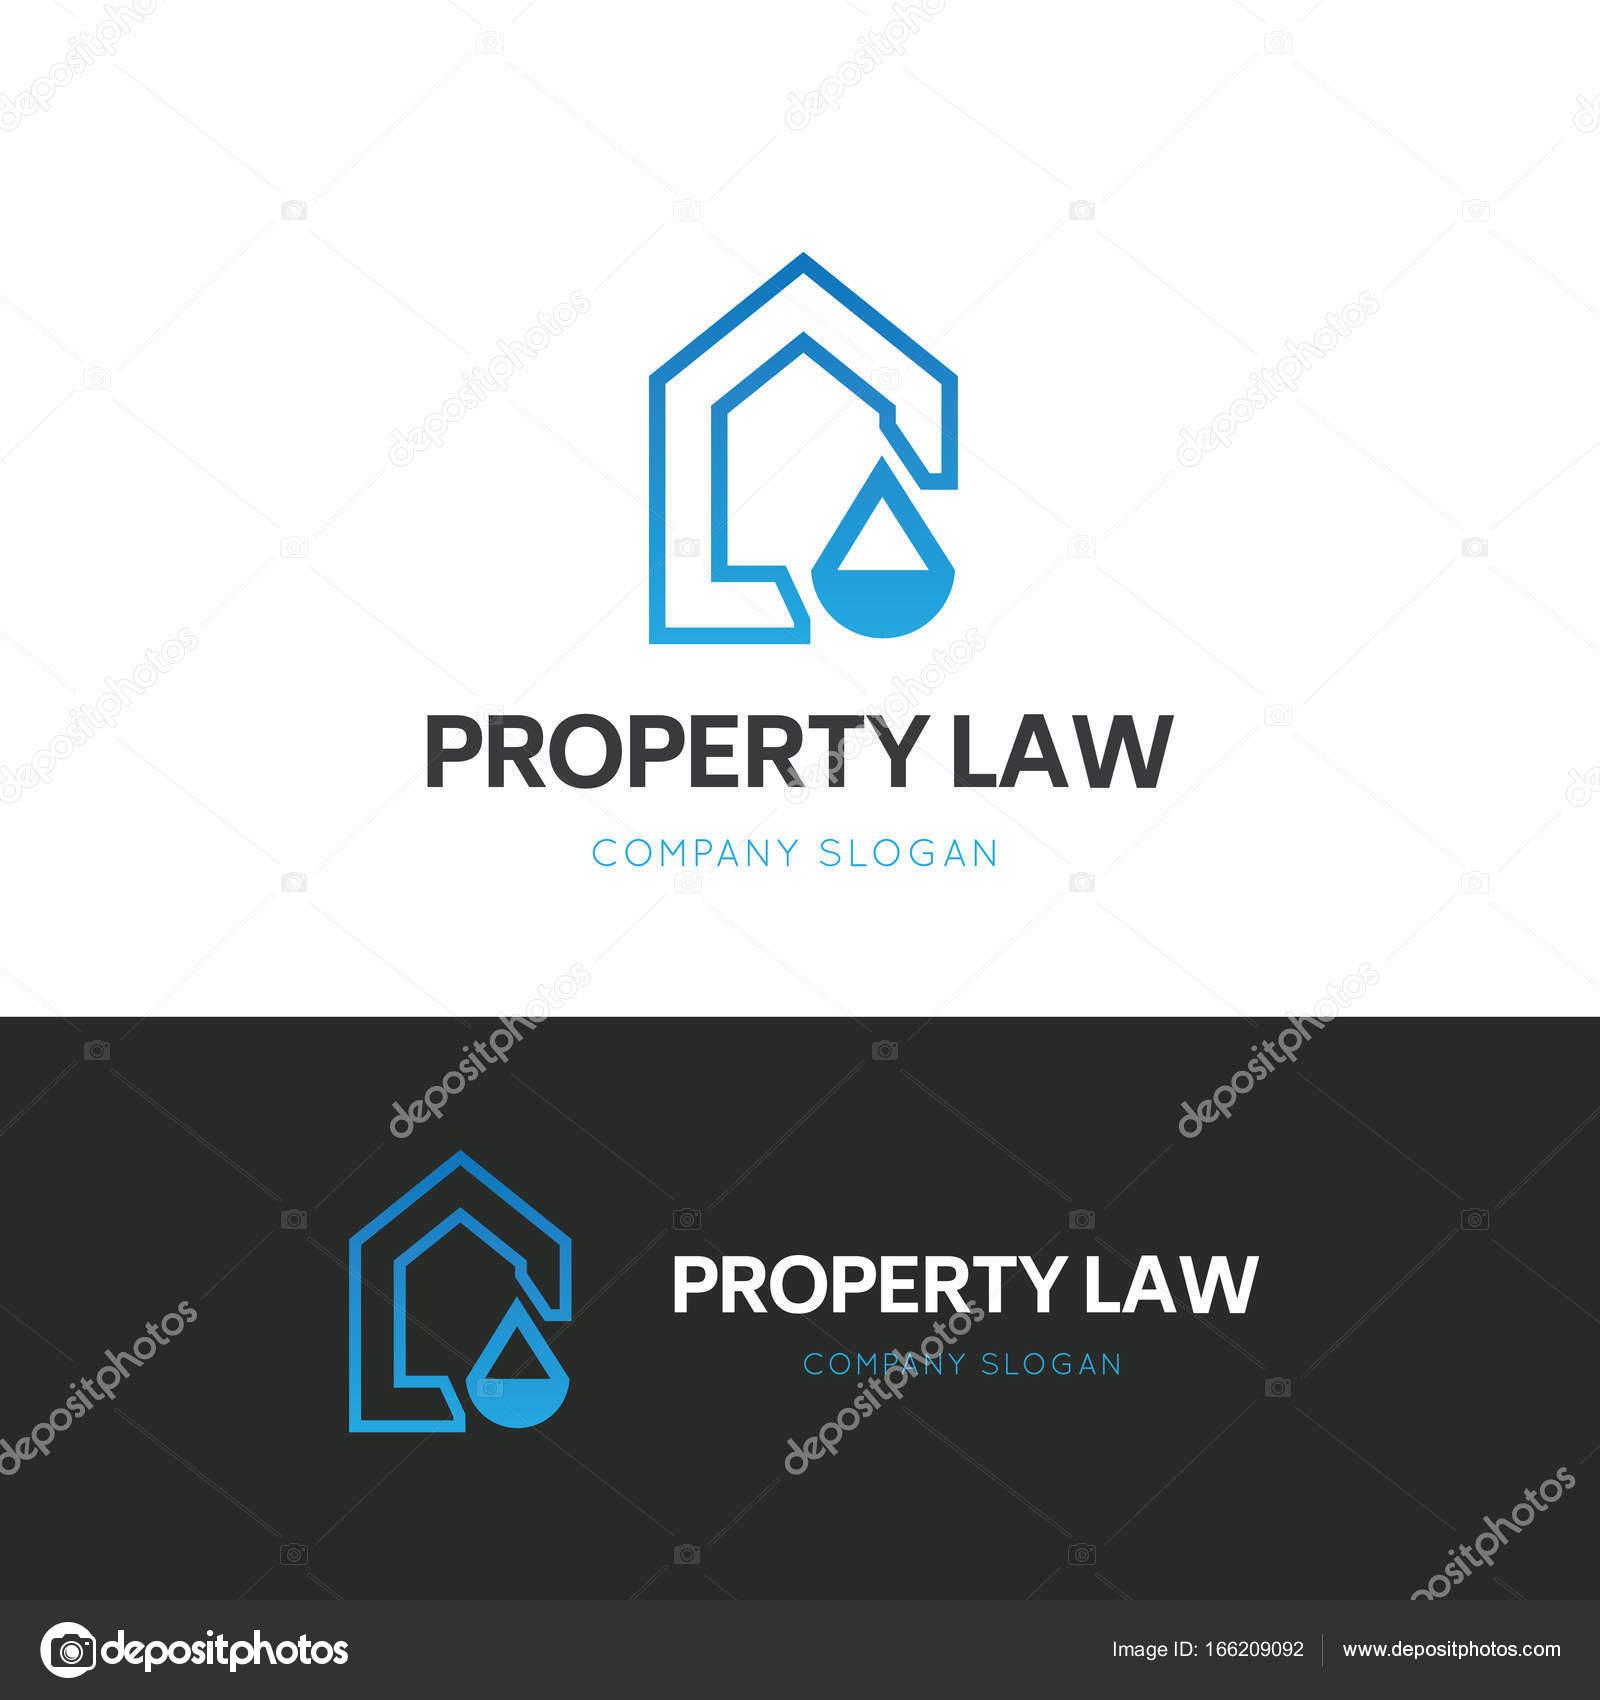 Creative law firm logos | Law firm logo icon vector design